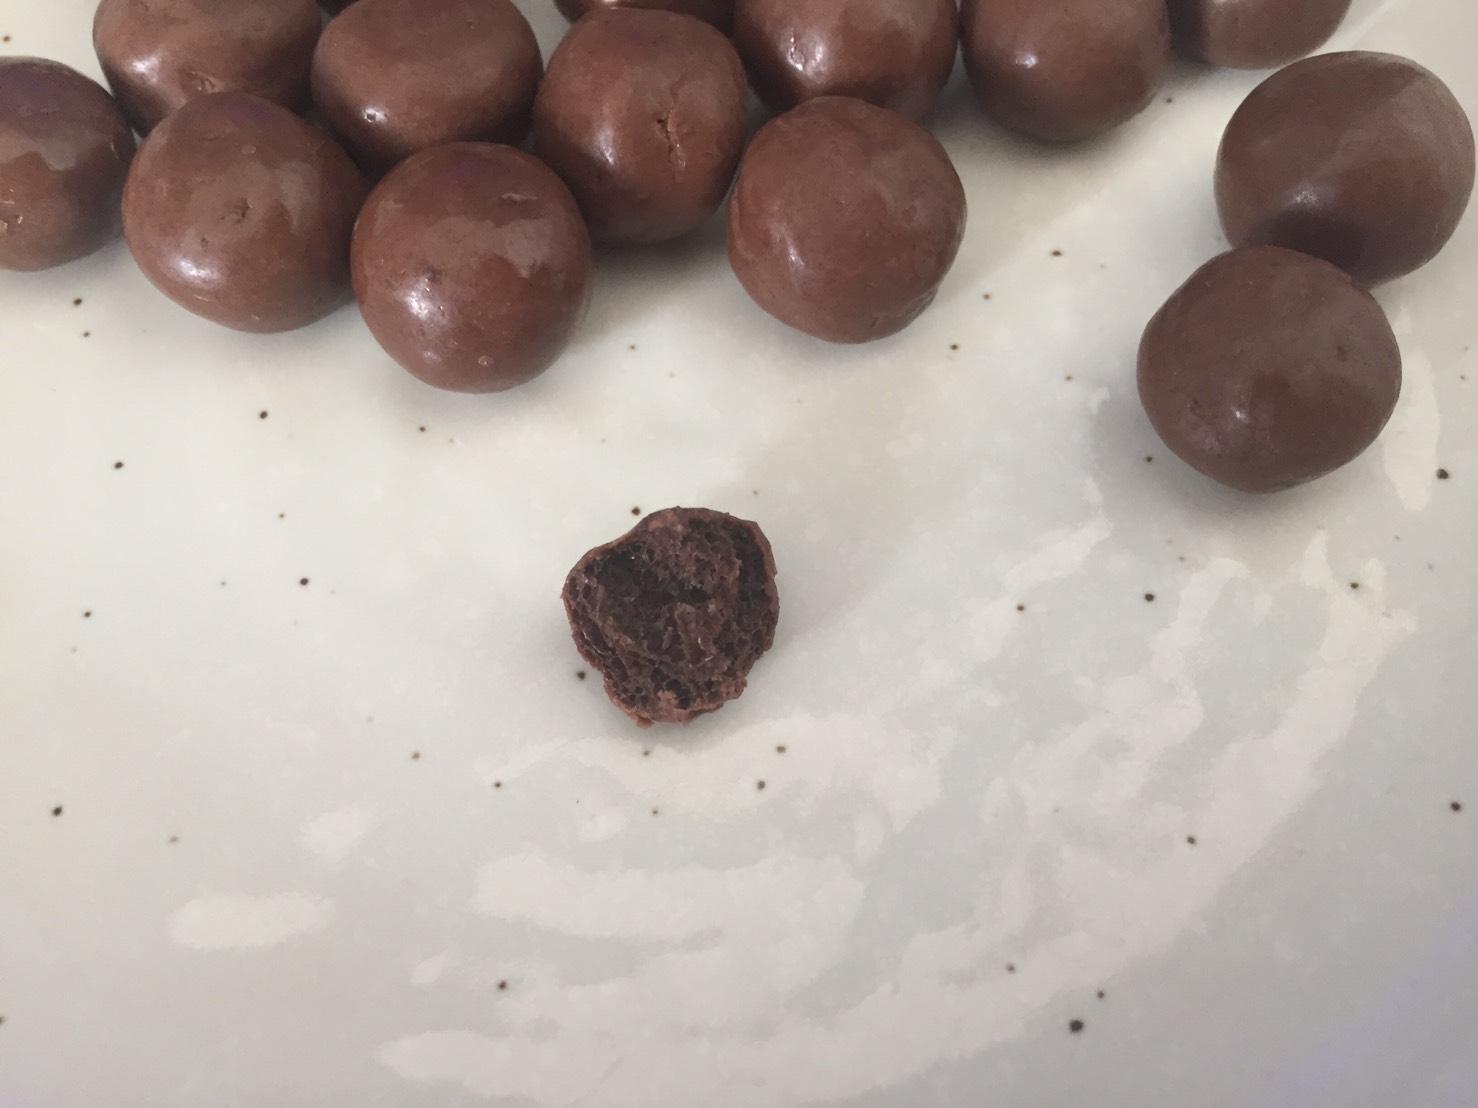 「CHOCOLATE PROTEIN BALLS(チョコレート・プロテインボール)」の断面図